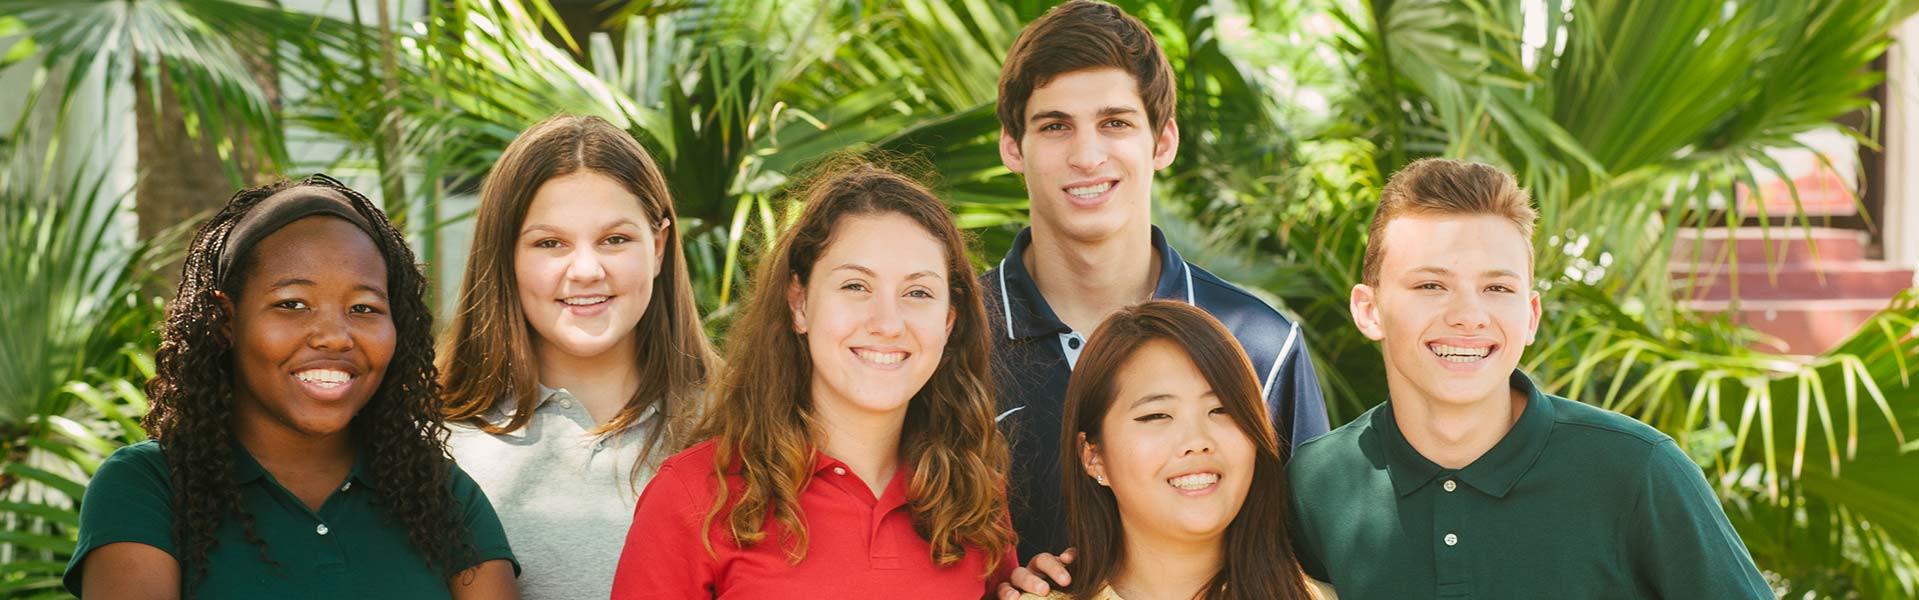 FloridaPrepAcademy-USA-FL-Students-Banner